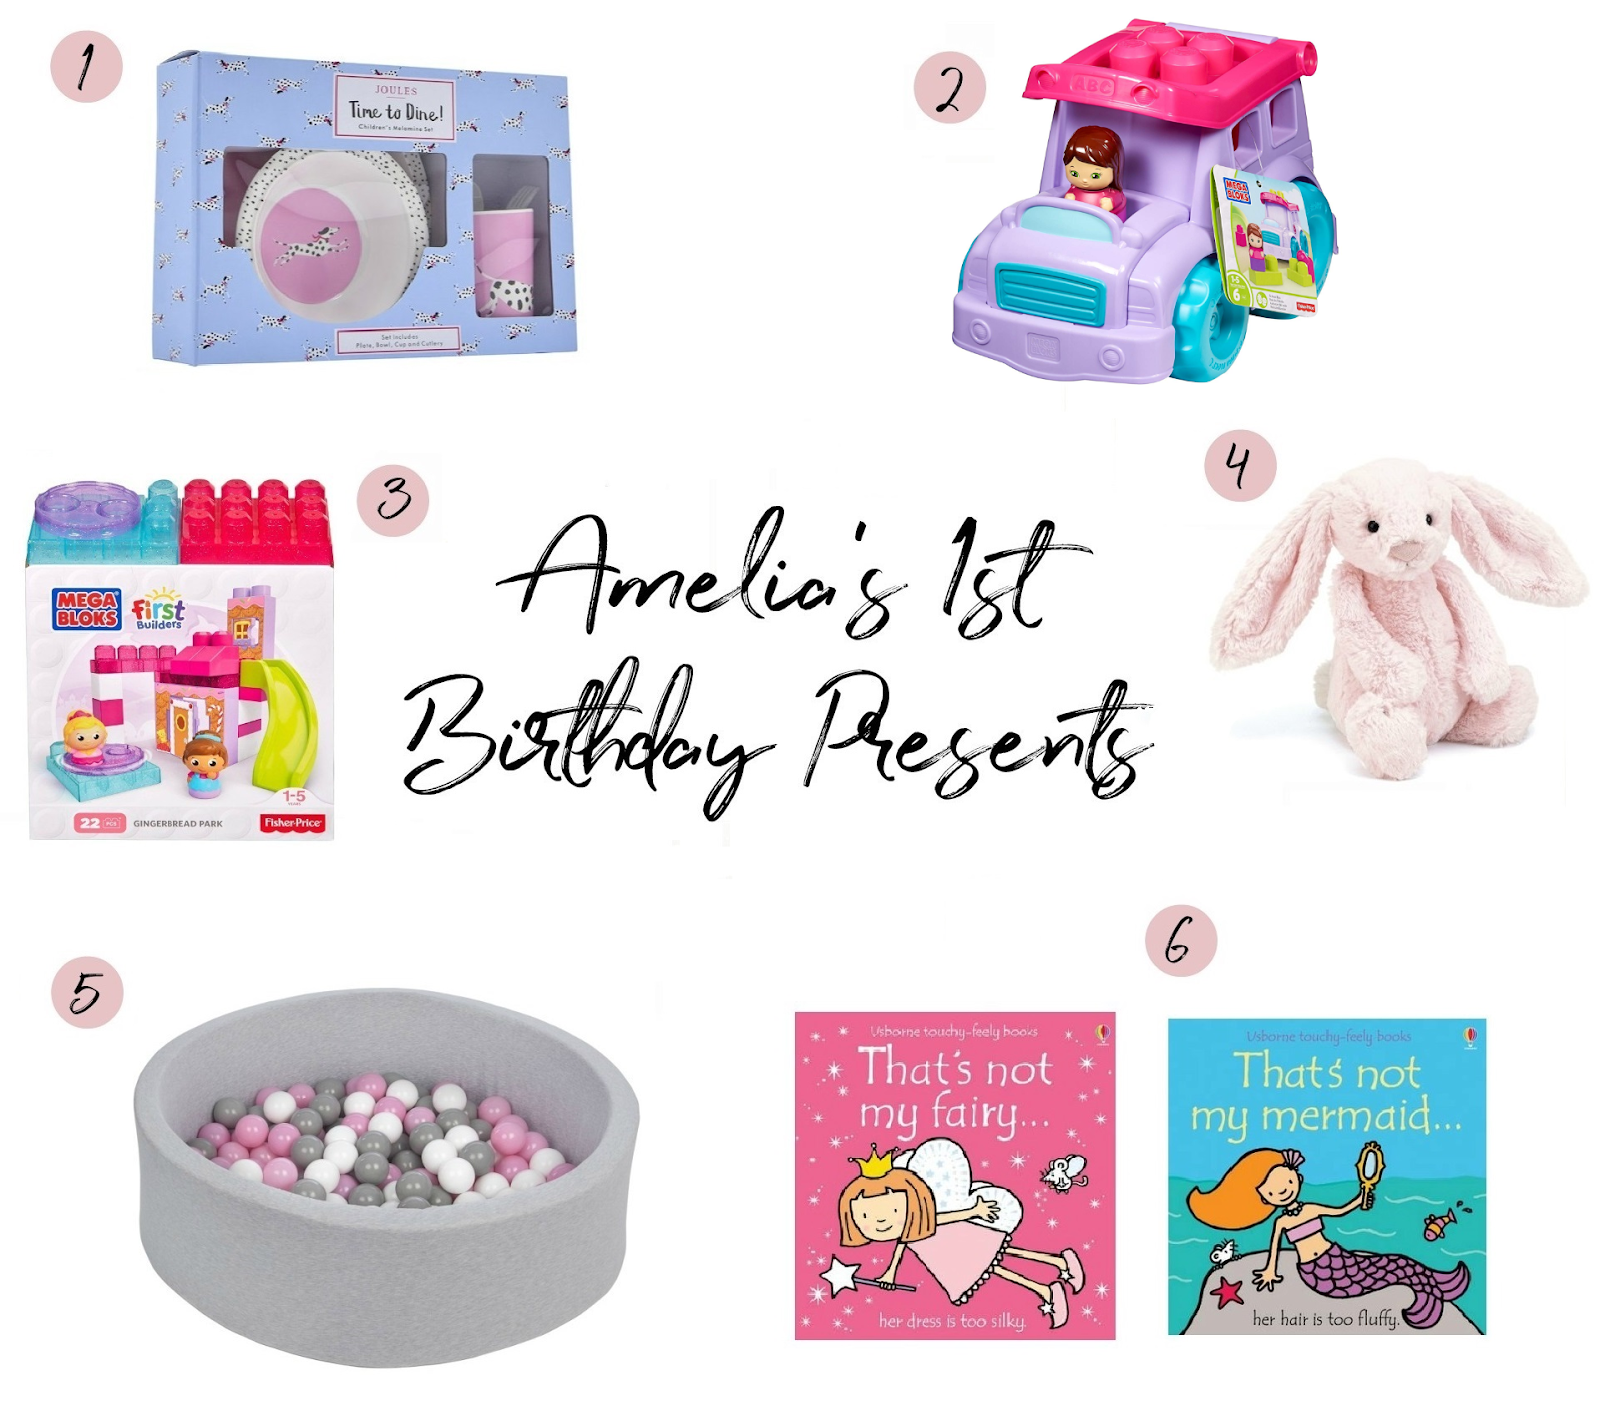 Amelias 1st Birthday Presents